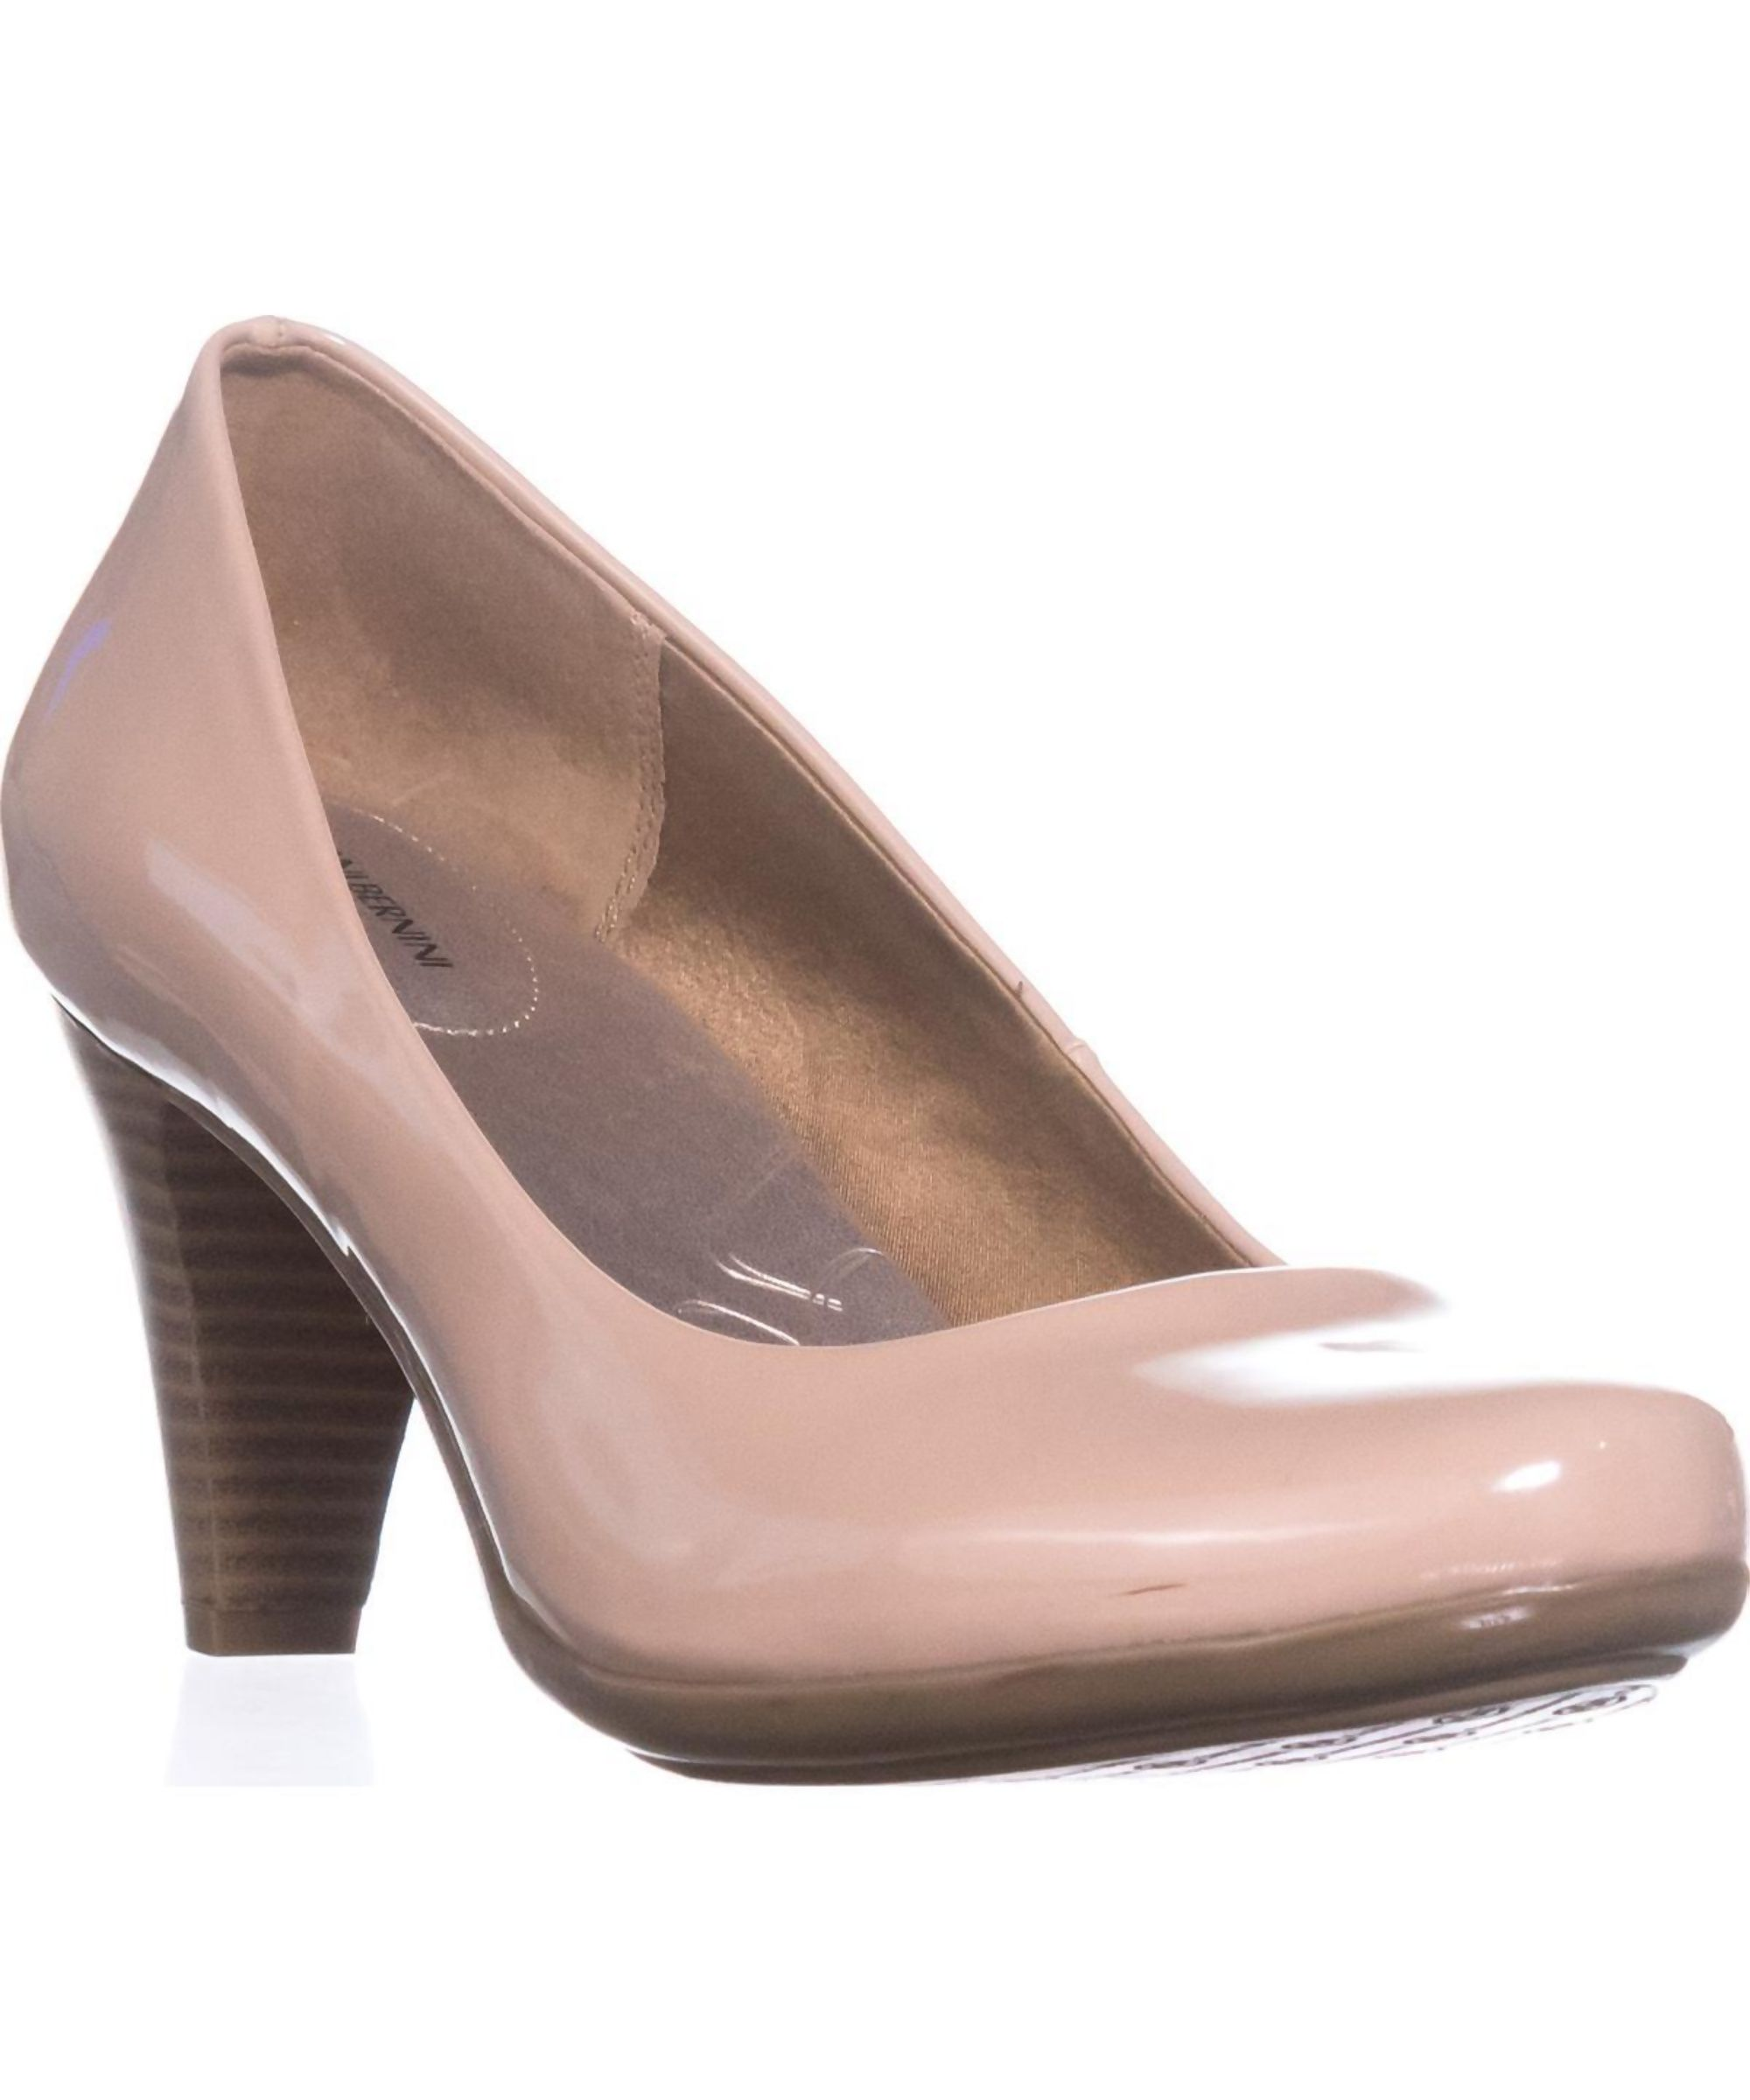 30c26fc11e GIANI BERNINI   Gb35 Sweets Classic Pumps, Nude #Shoes #Pumps & High Heels #GIANI  BERNINI